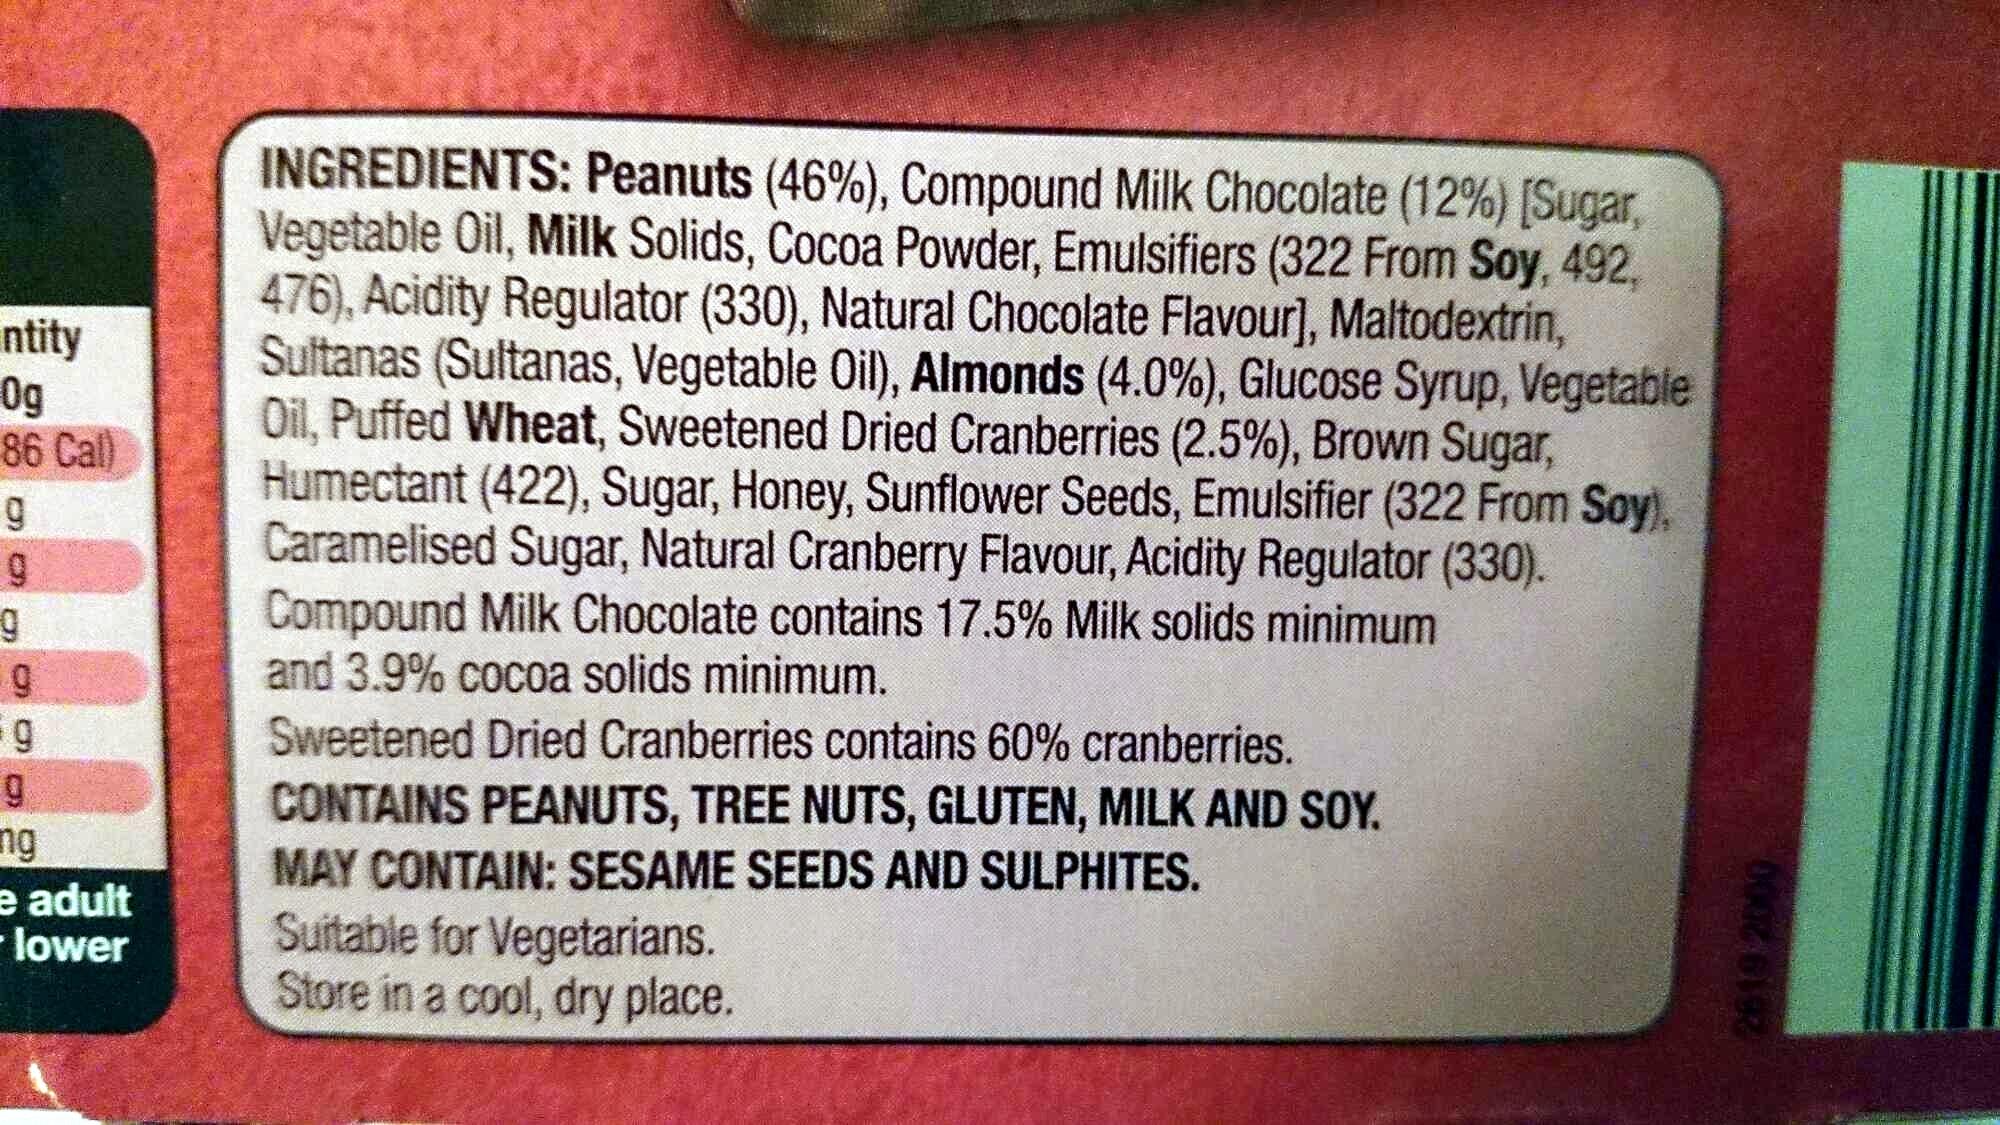 Nut Bars Choc Almond & Cranberry - Ingredients - en